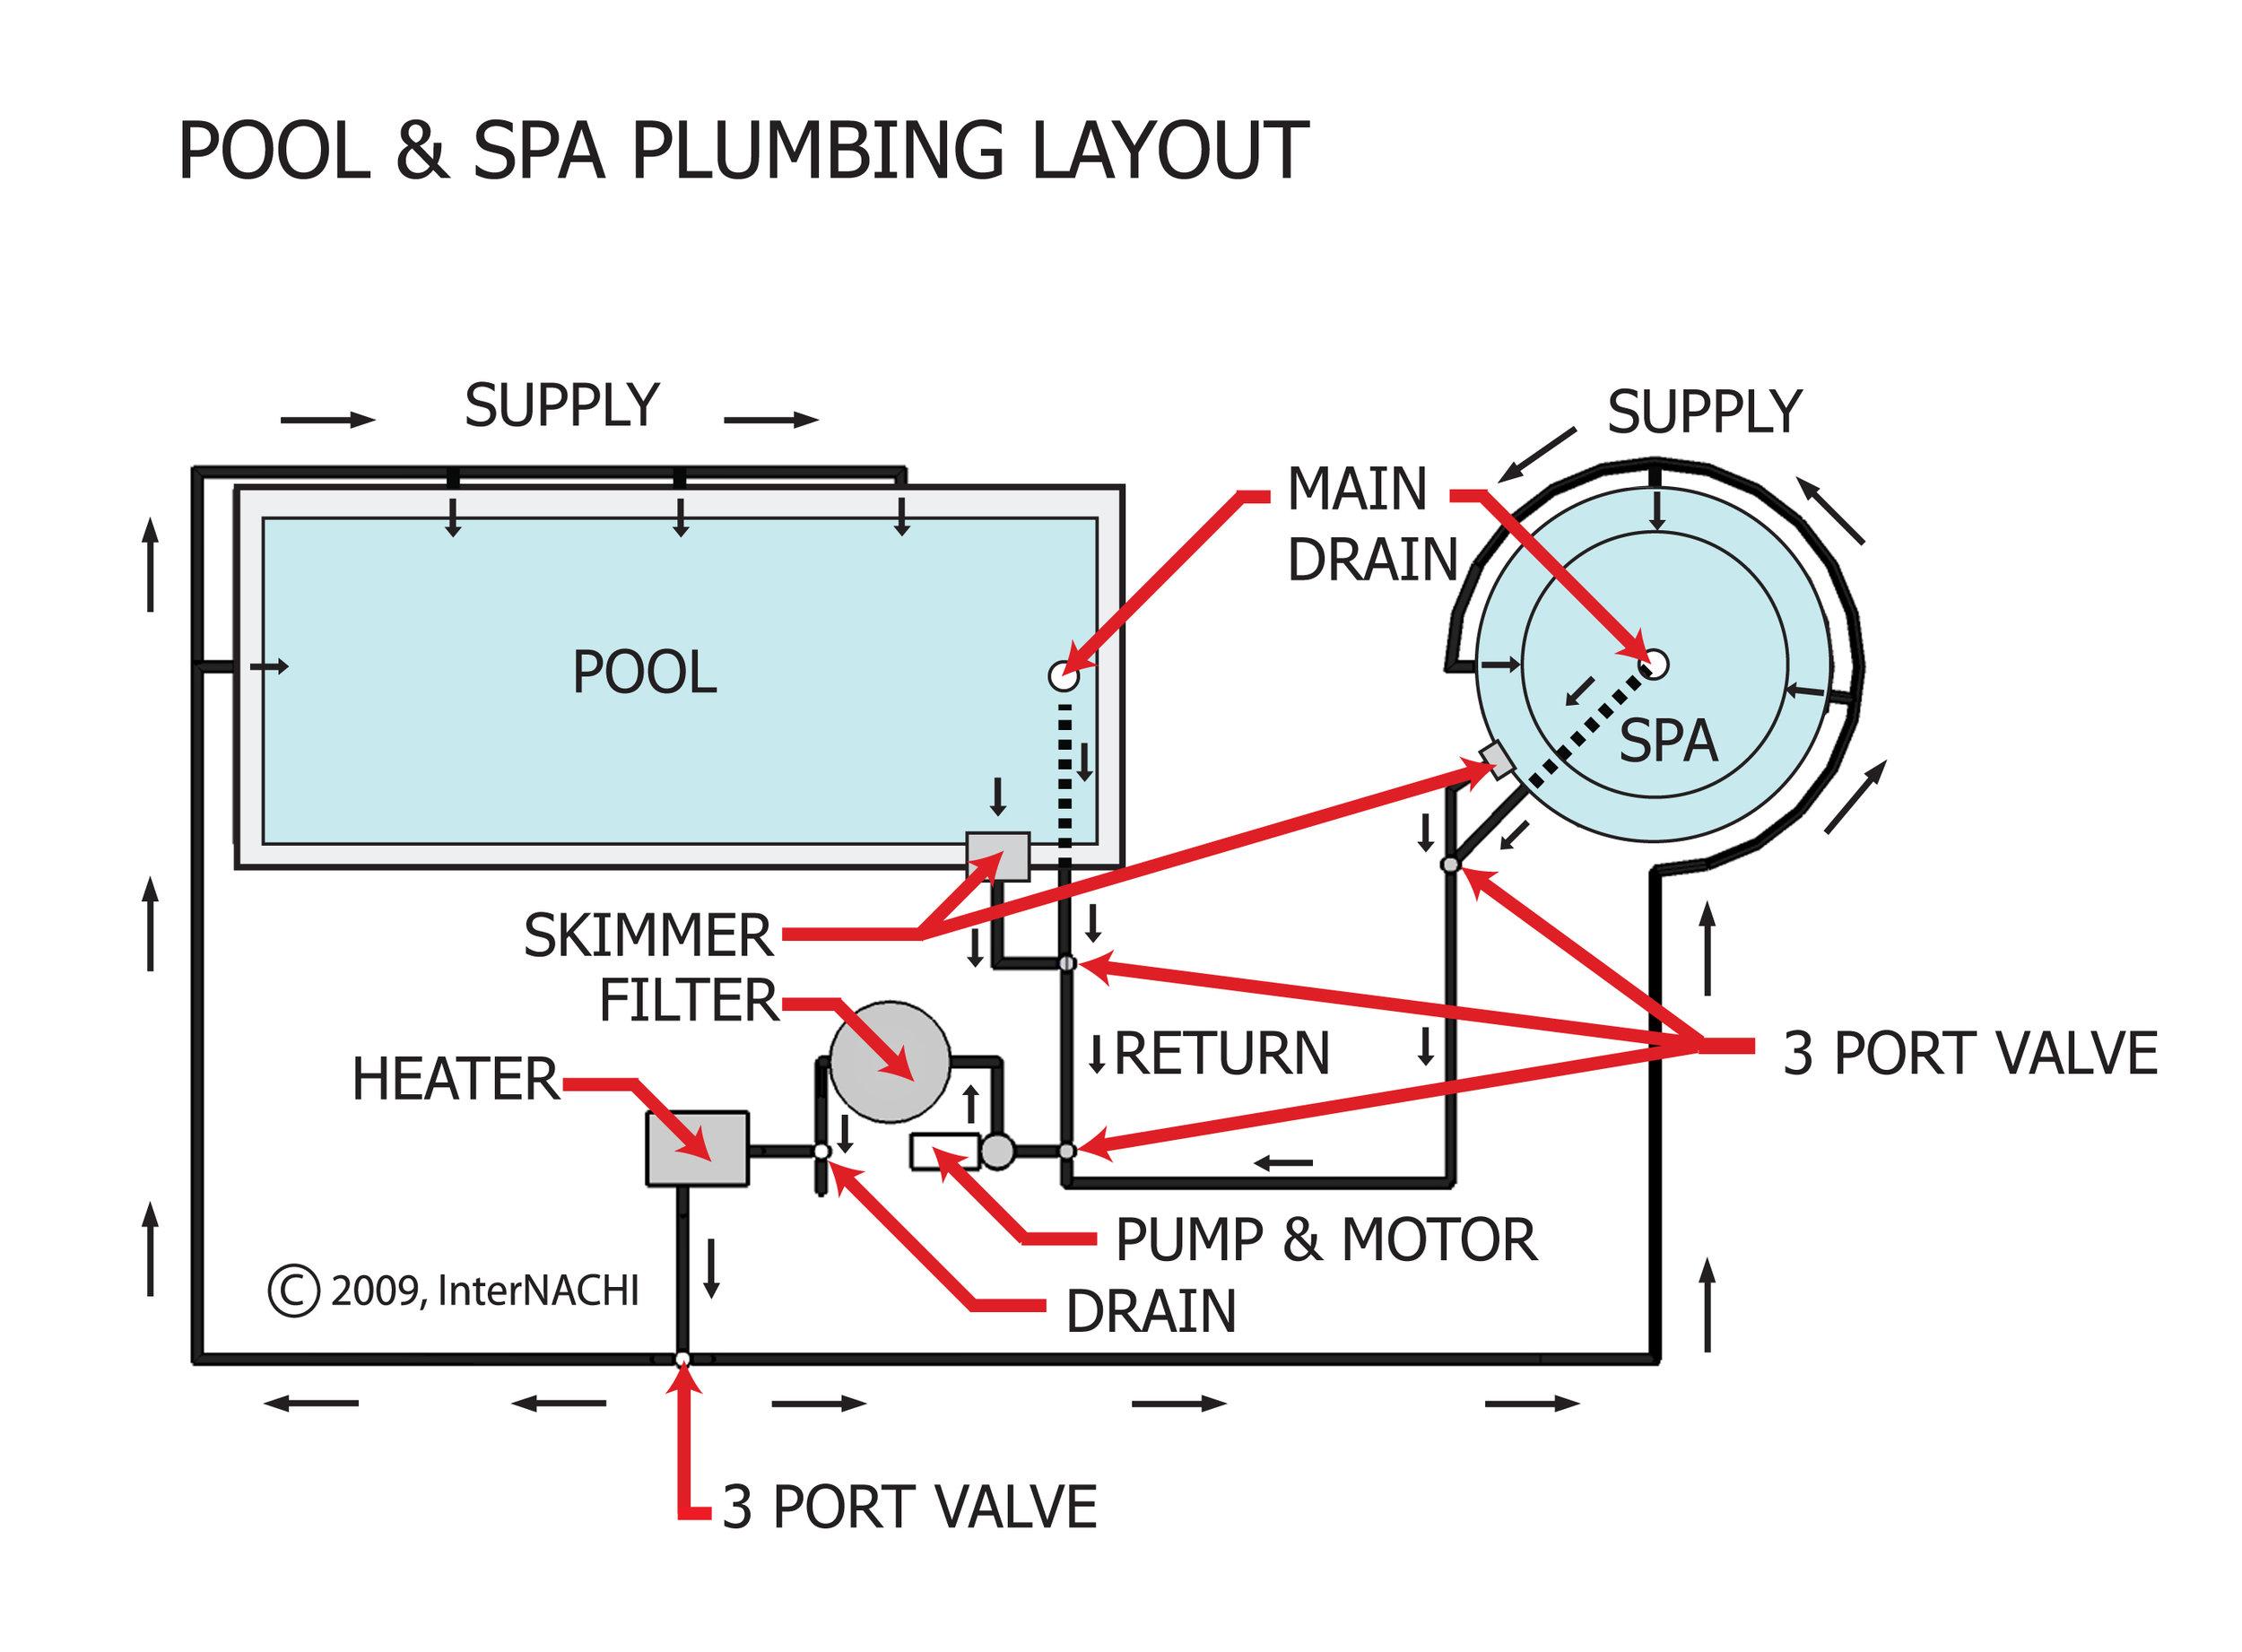 pool-spay-plumbing-layout-3.jpg